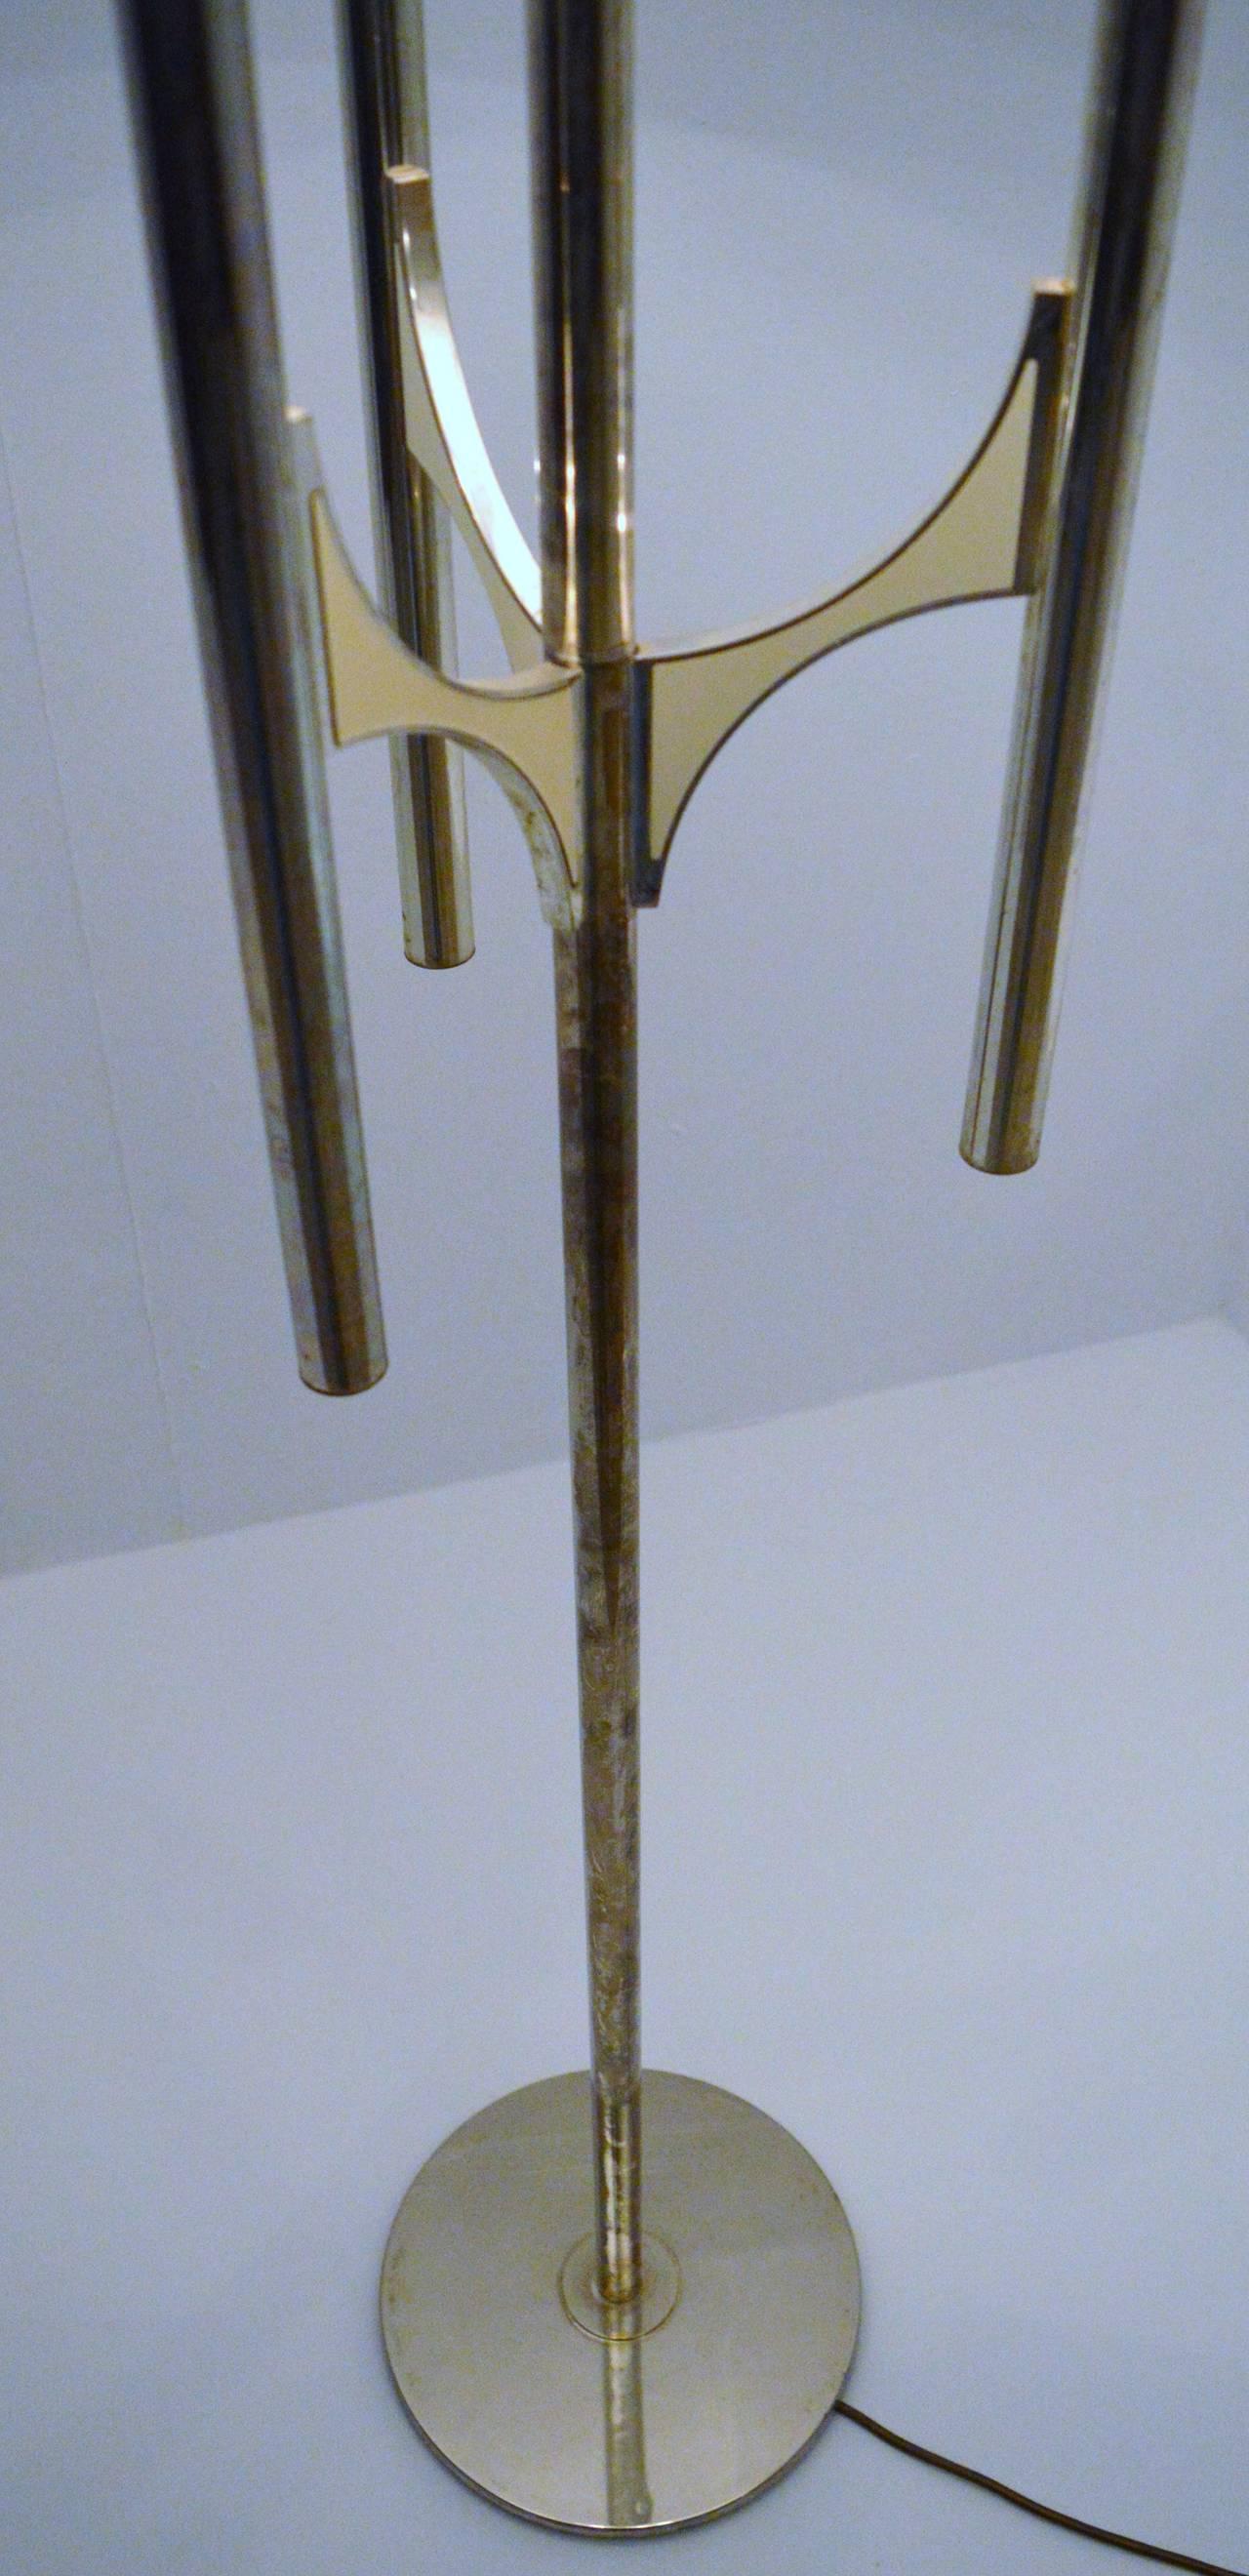 Floor lamp by gaetano sciolari 1970s for sale at 1stdibs for 1970s floor lamps